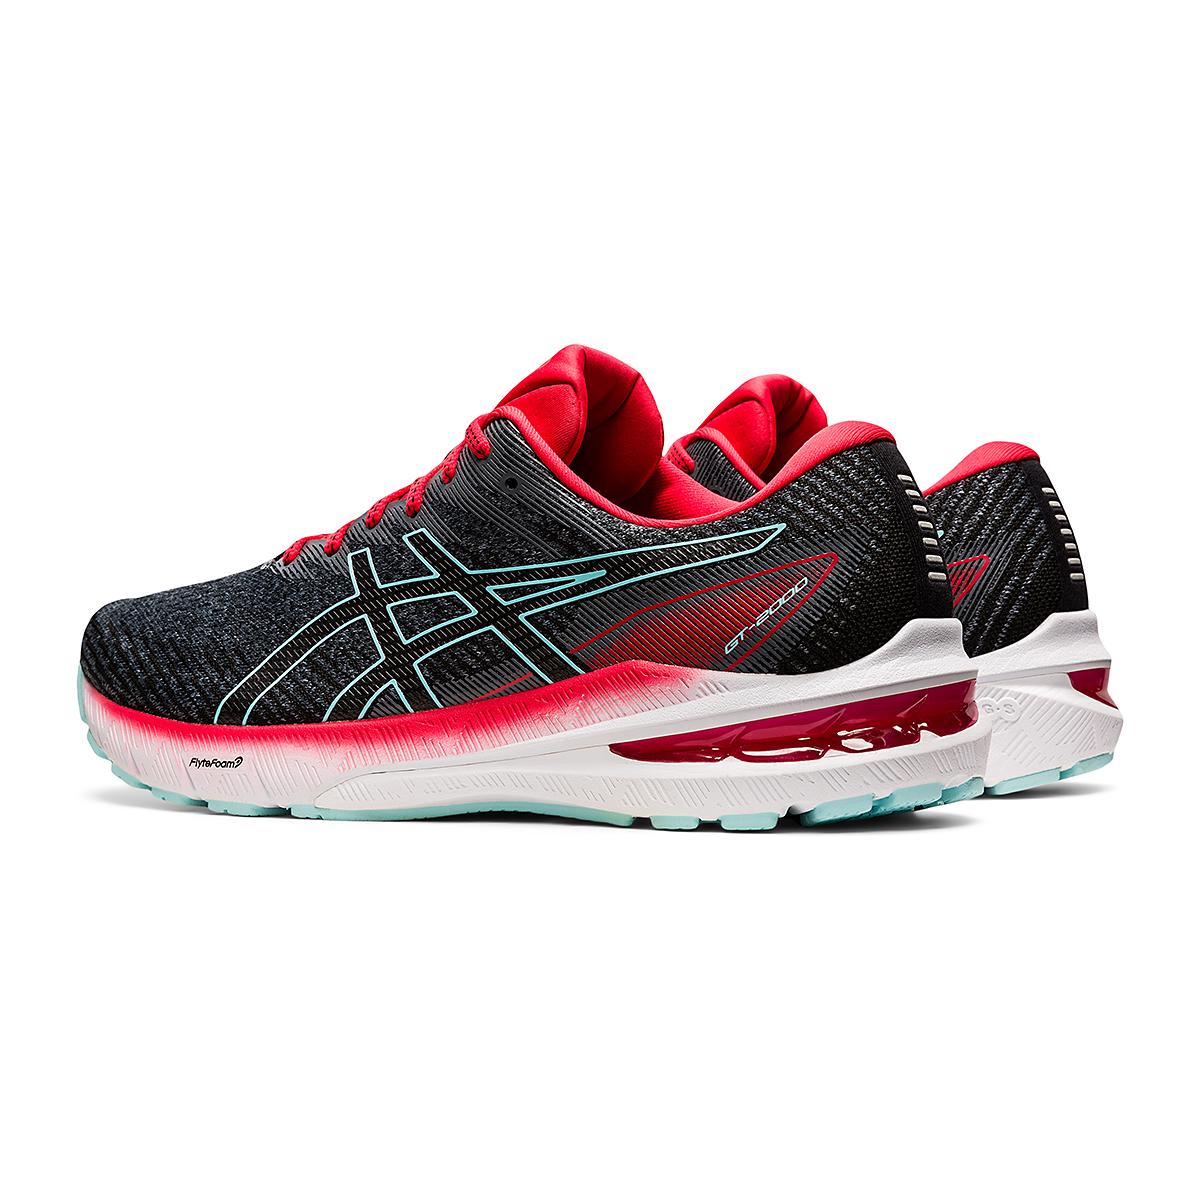 Men's Asics GT-2000 10 Running Shoe - Color: Metropolis/Electric Red - Size: 7 - Width: Regular, Metropolis/Electric Red, large, image 4